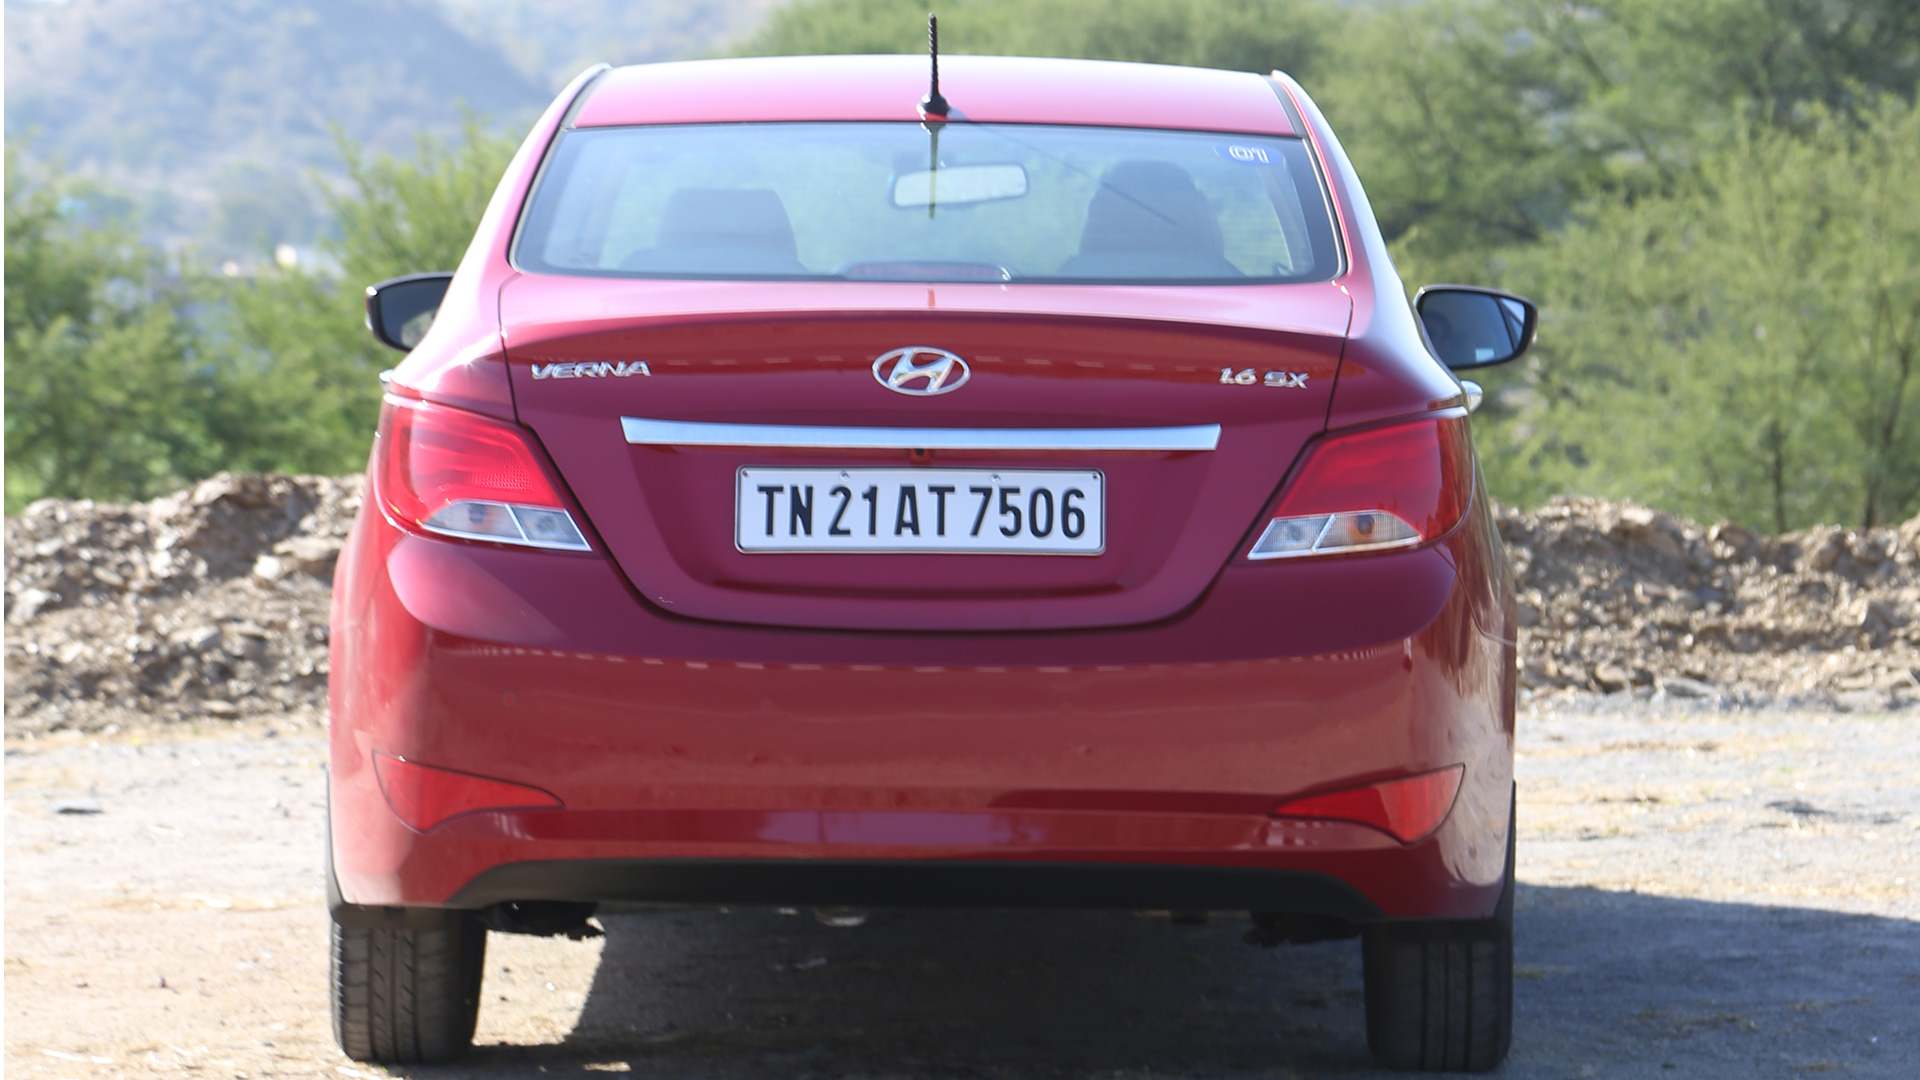 Hyundai-4s-fluidic-verna-2015 Compare